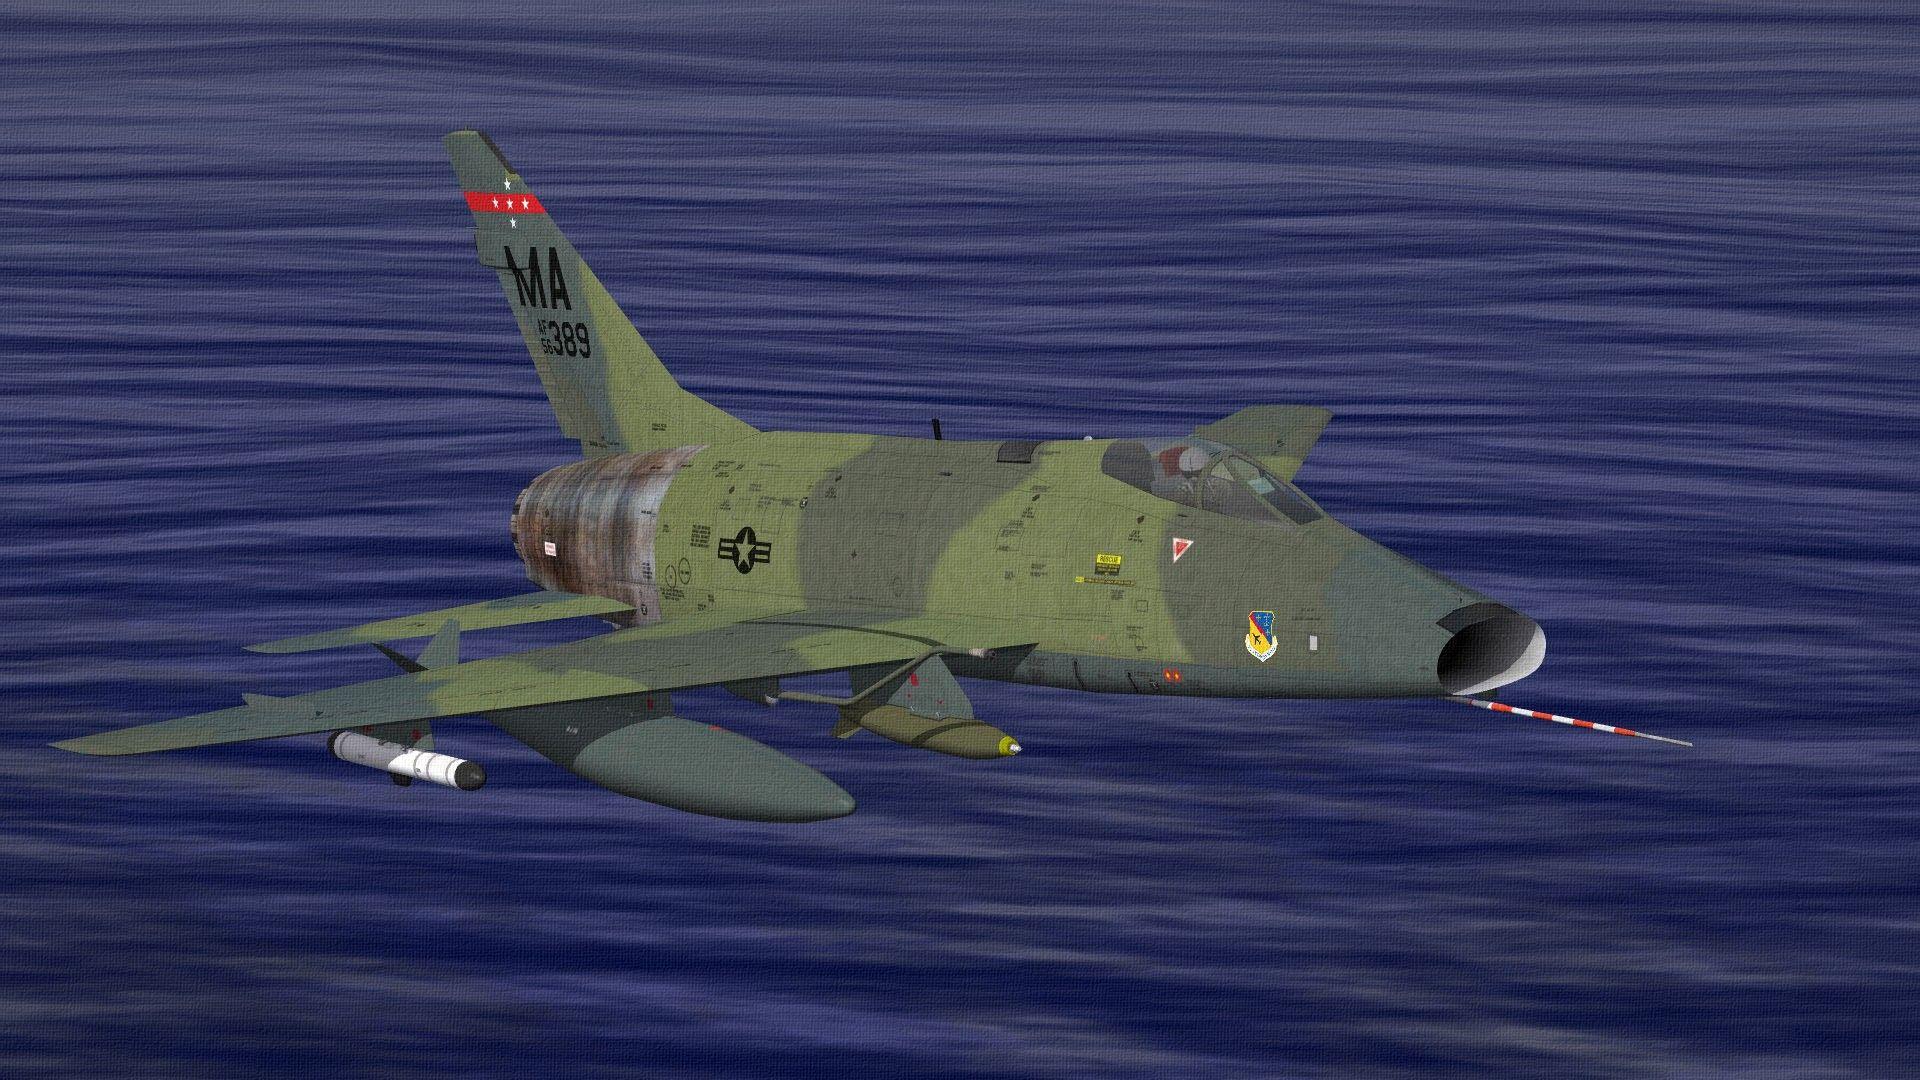 USAFF-100GSUPERSABRE05.jpg